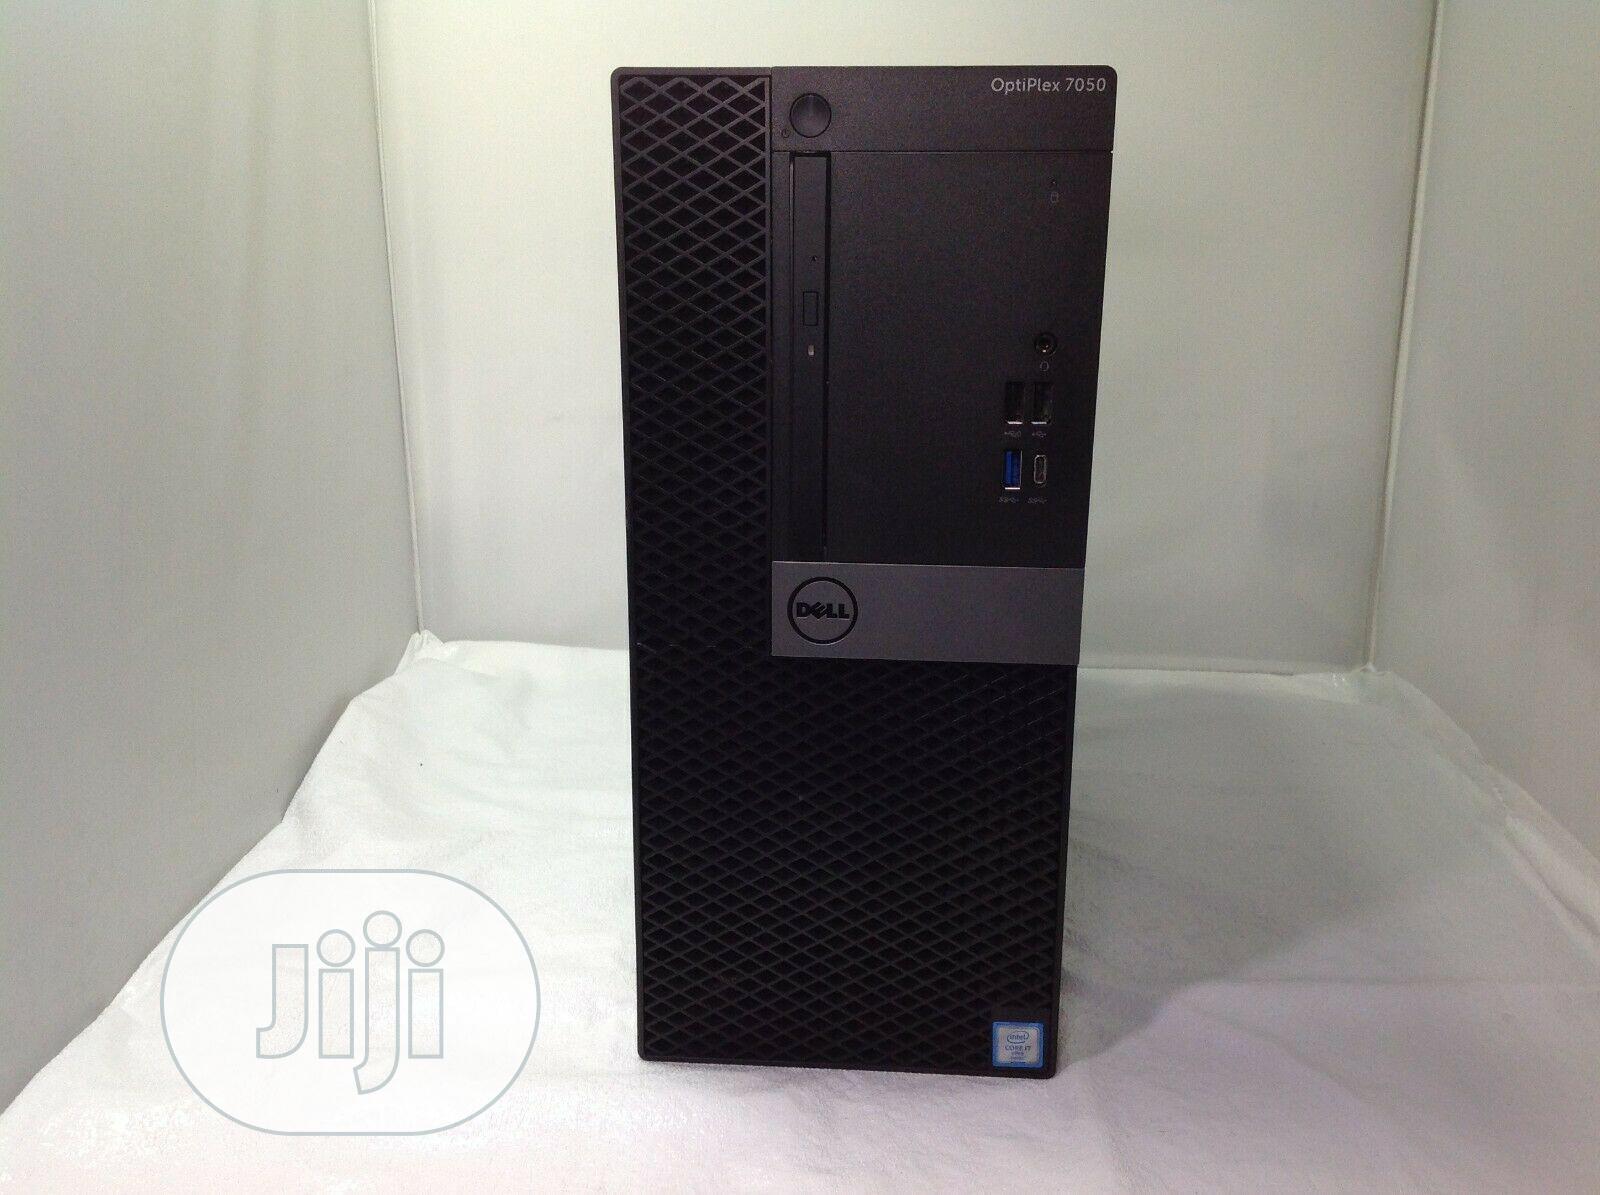 New Desktop Computer Dell OptiPlex 7050 16GB Intel Core i7 HDD 1T   Laptops & Computers for sale in Ikeja, Lagos State, Nigeria